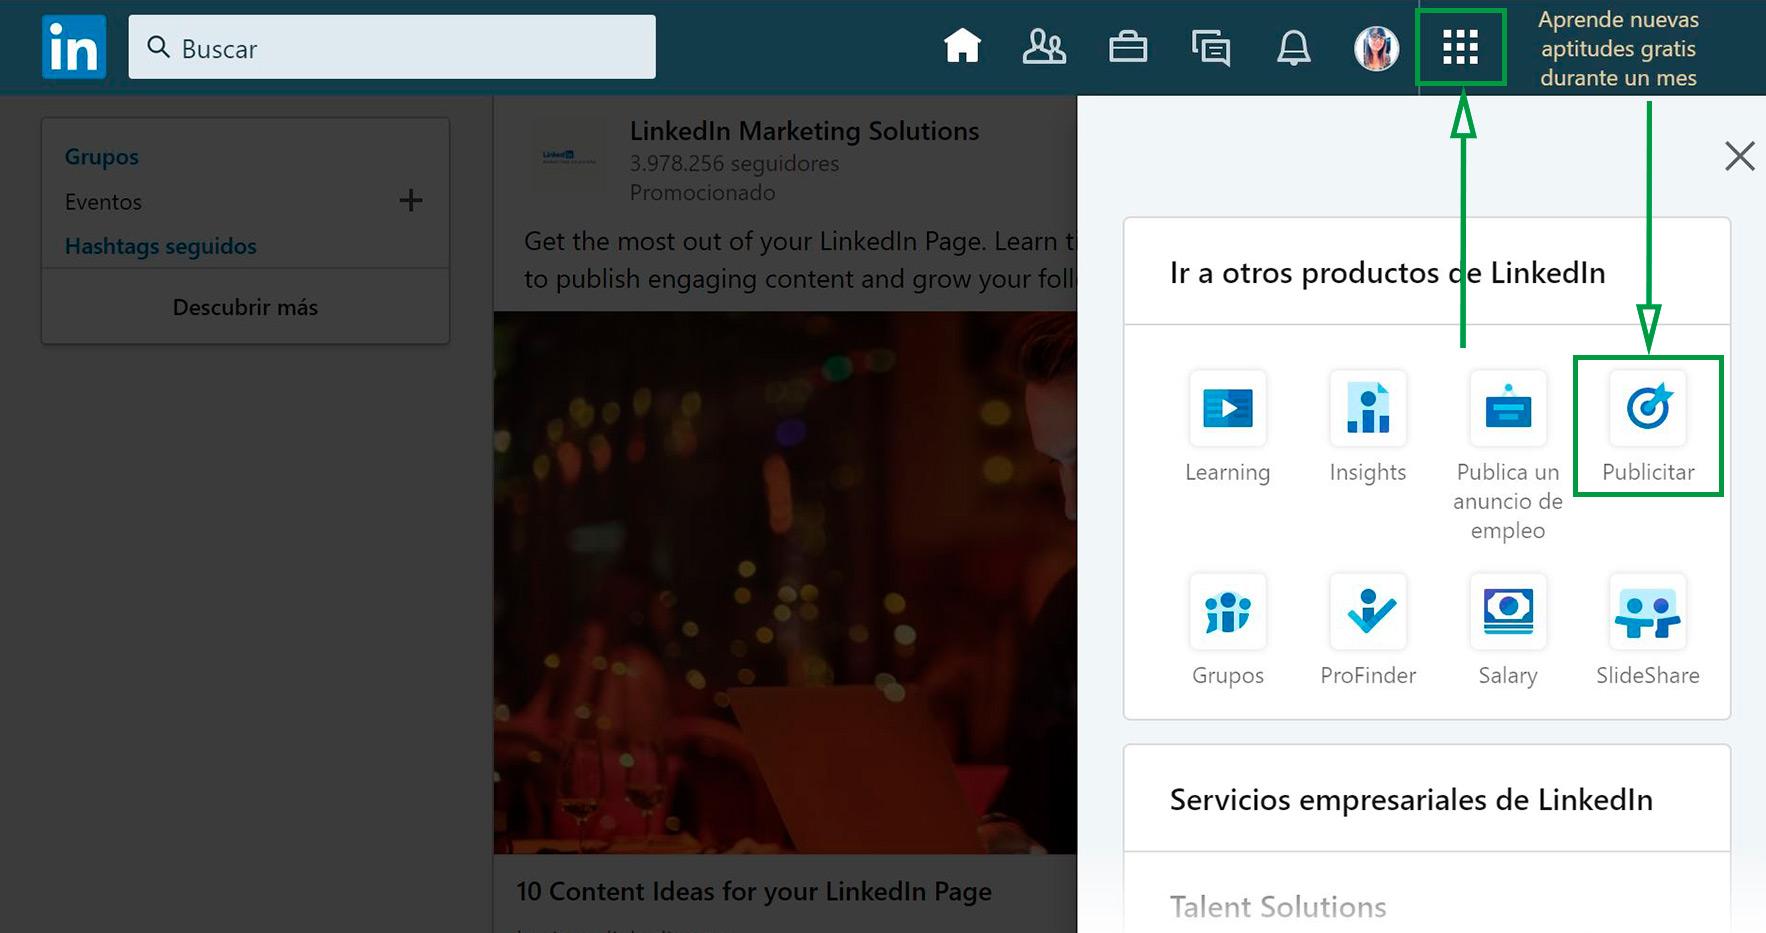 6 Cómo usar Linkedin para captar clientes. Aplicaciones Linkedin